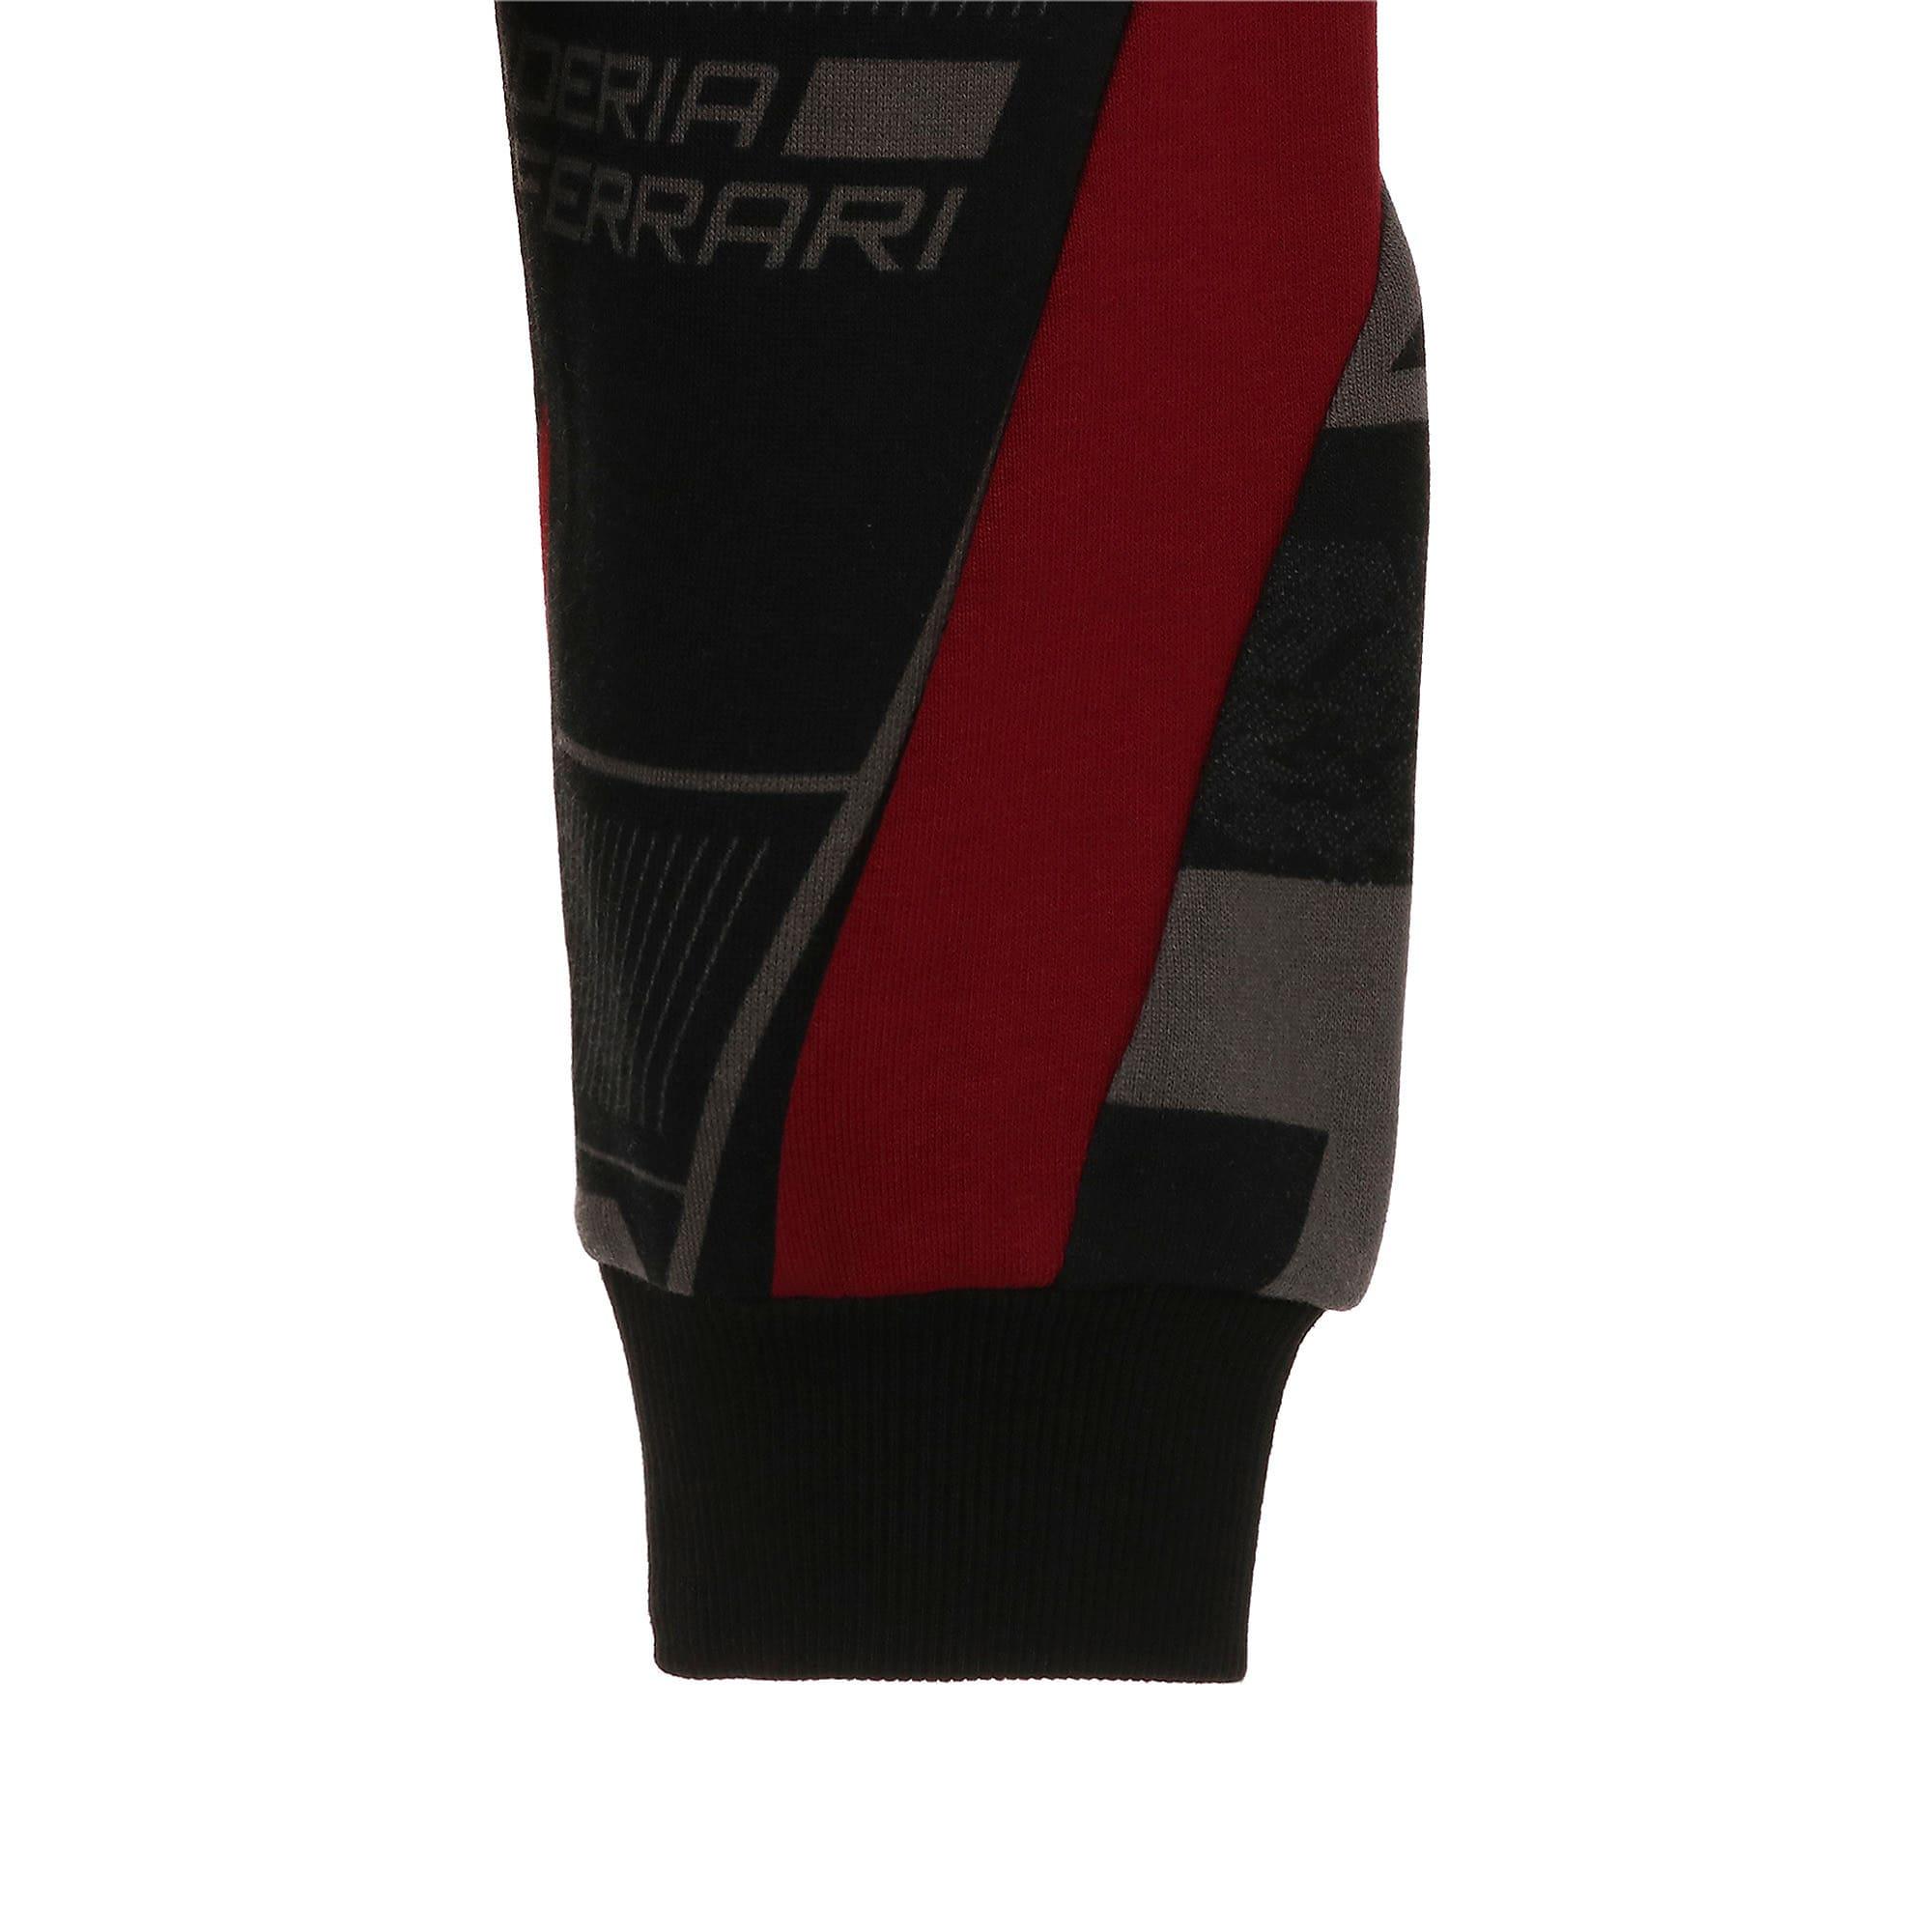 Thumbnail 4 of フェラーリ ストリート フーディー, Puma Black, medium-JPN